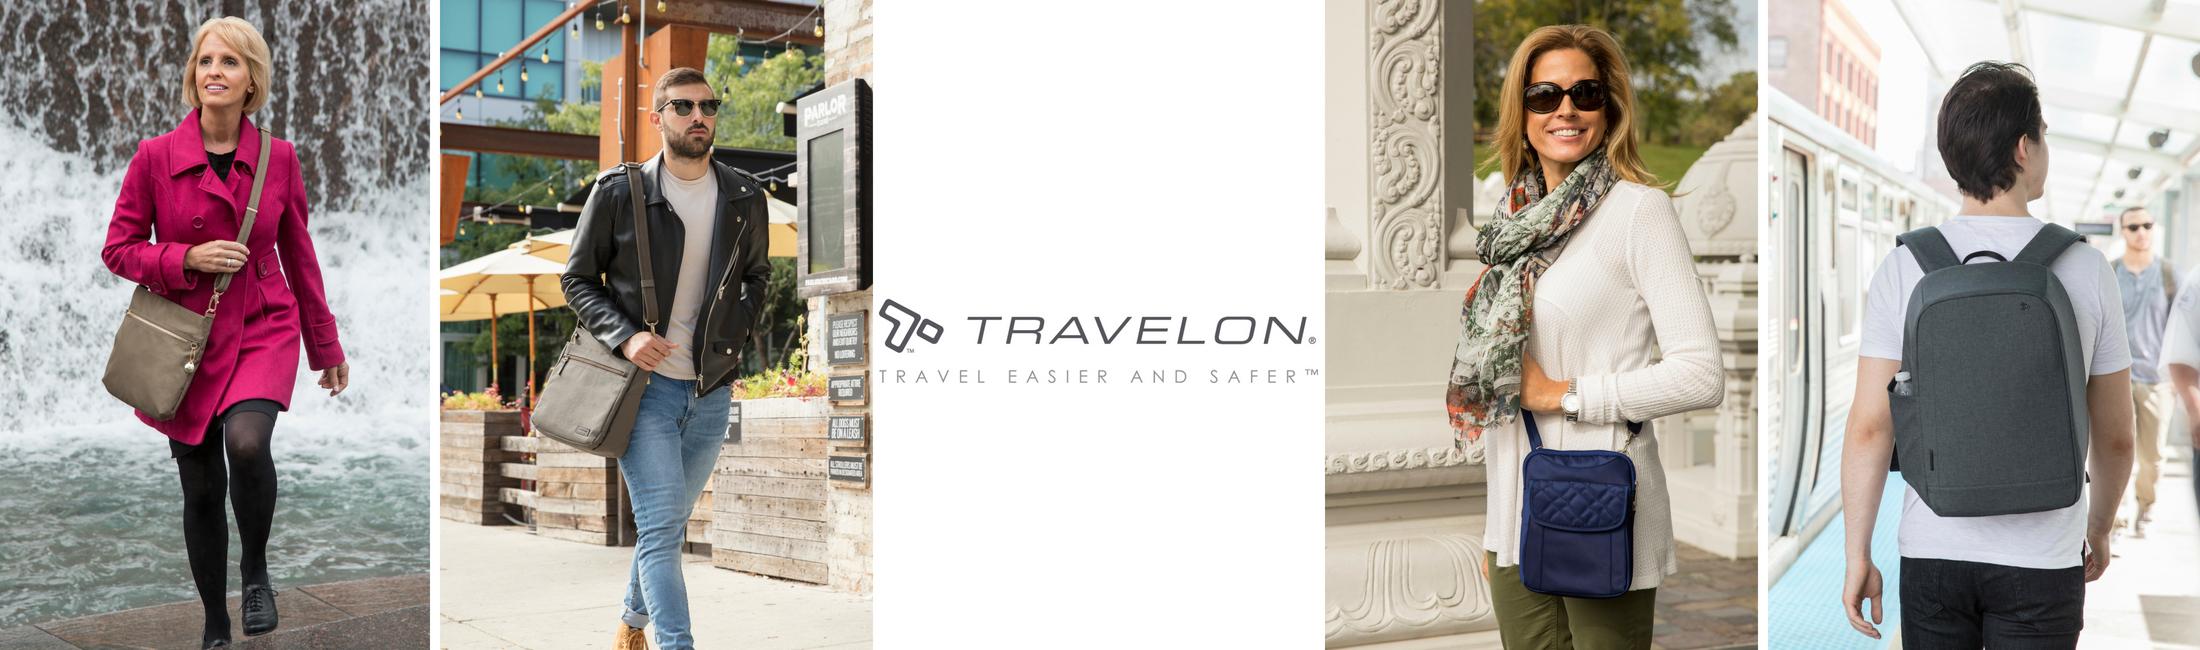 Travelon - TravelSmarts